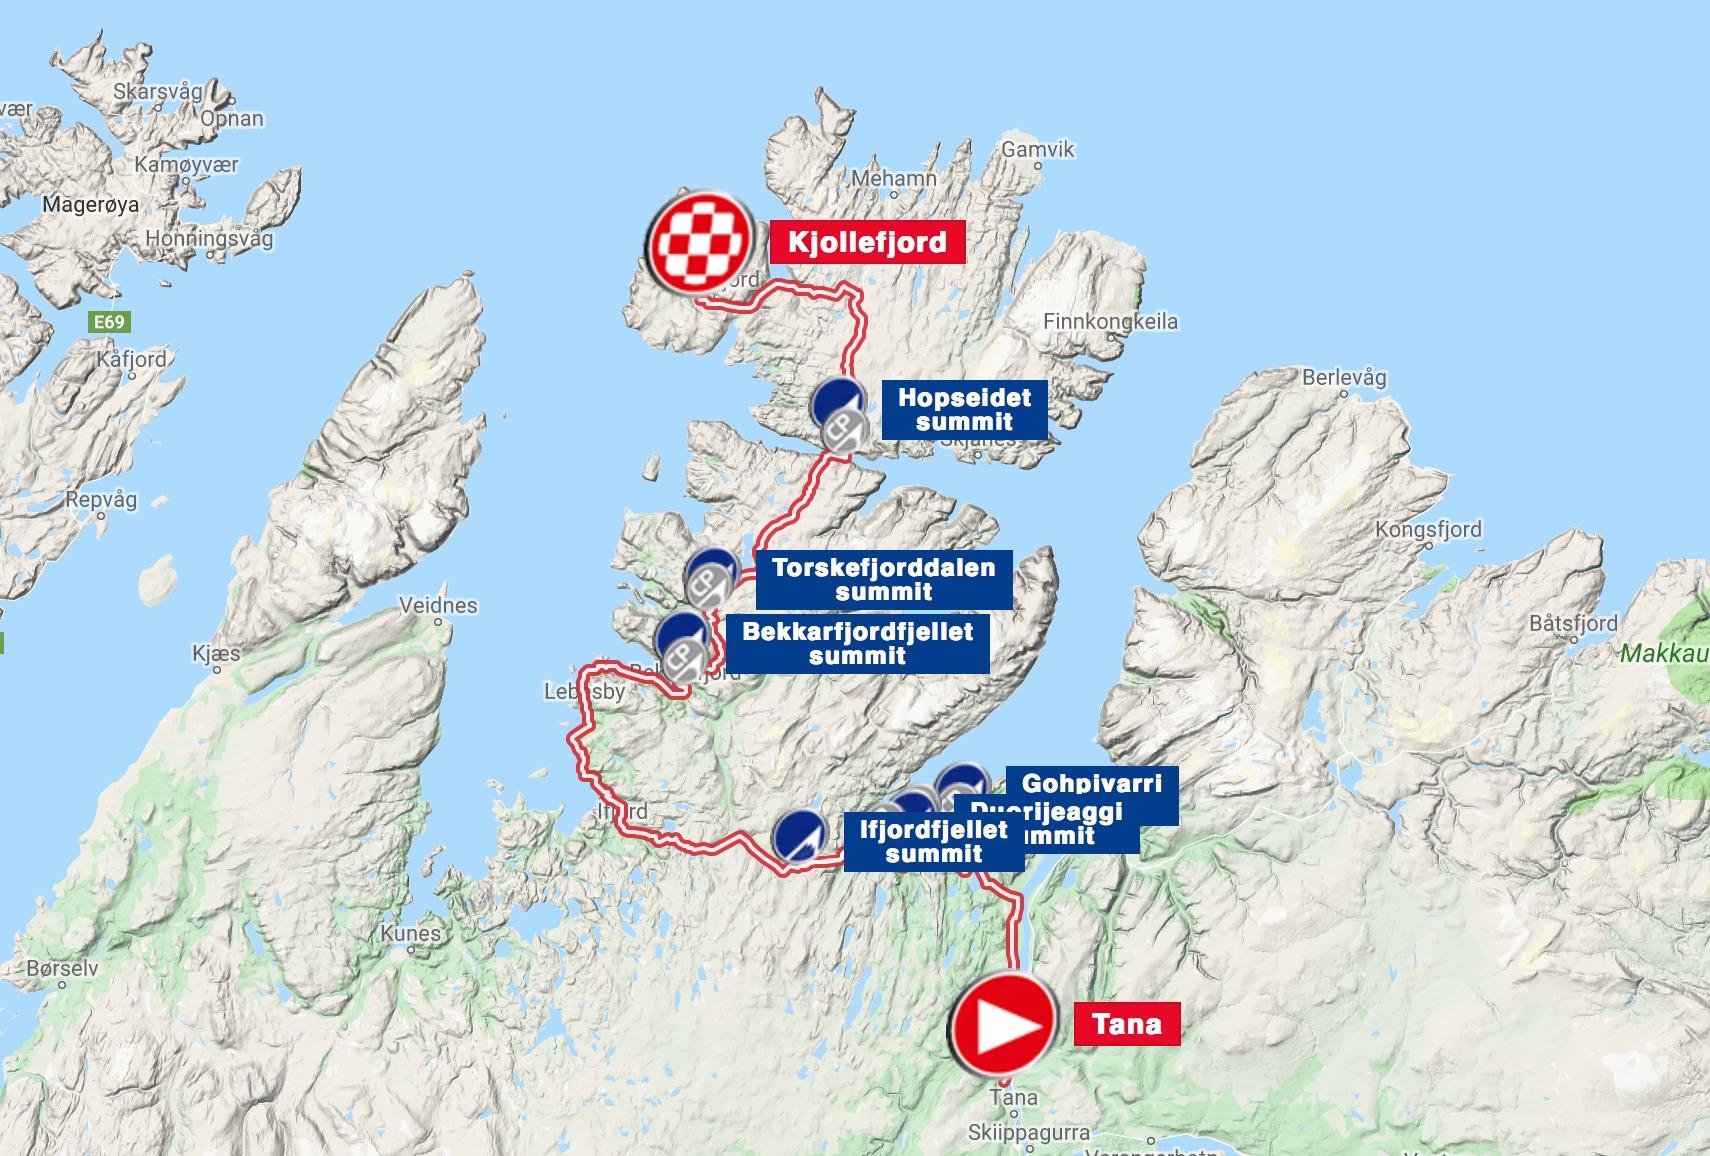 Arctic Tour Of Norway 2018